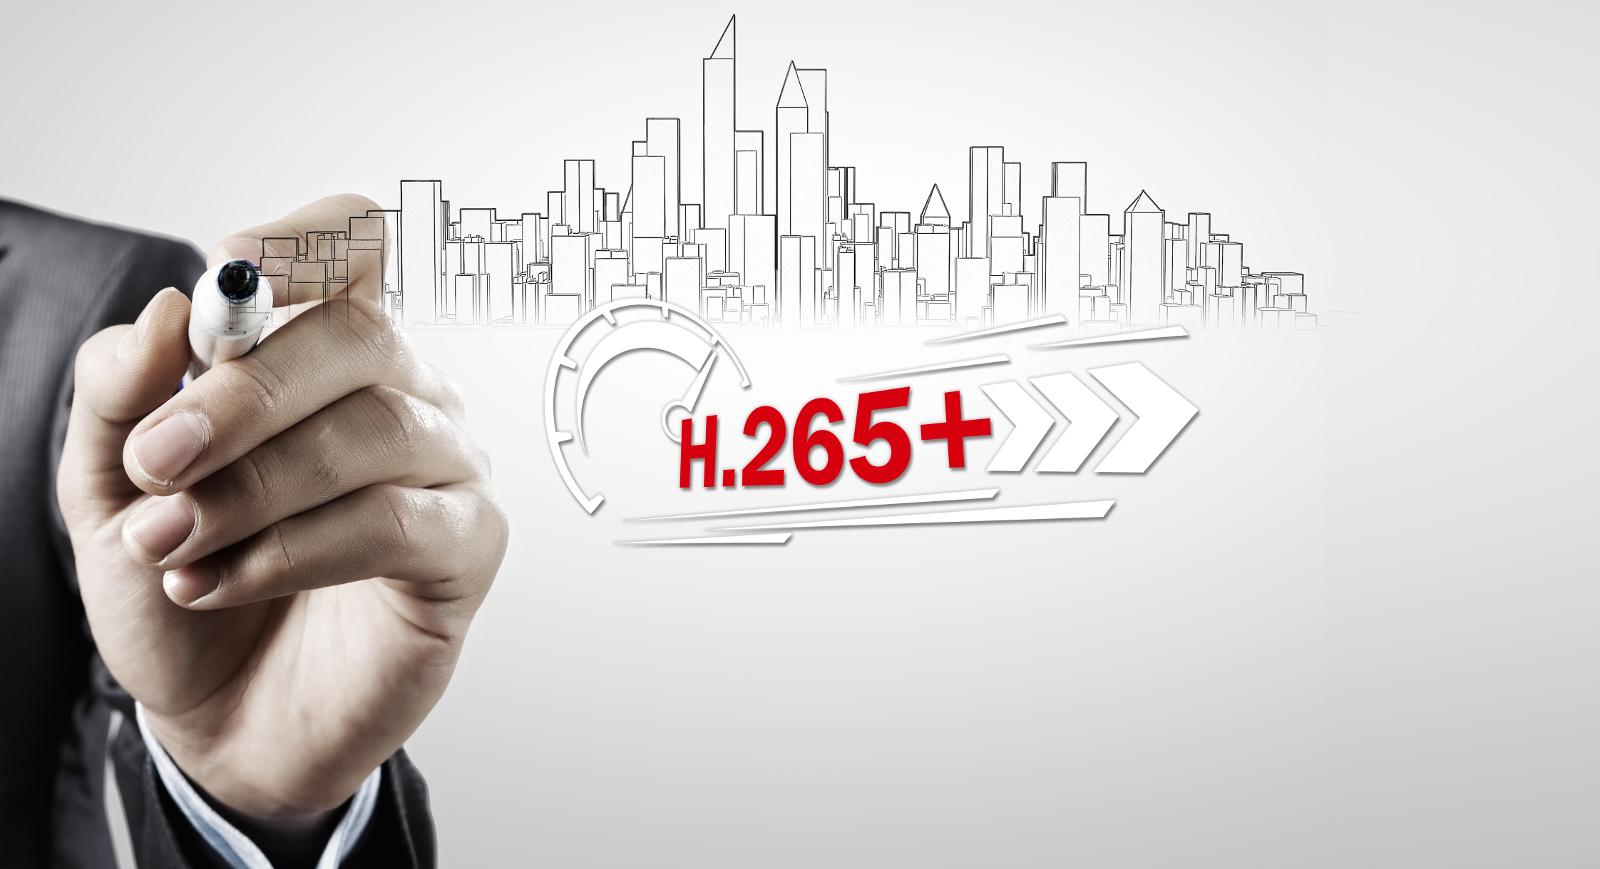 Doskonała kompresja H.265 Pro+.